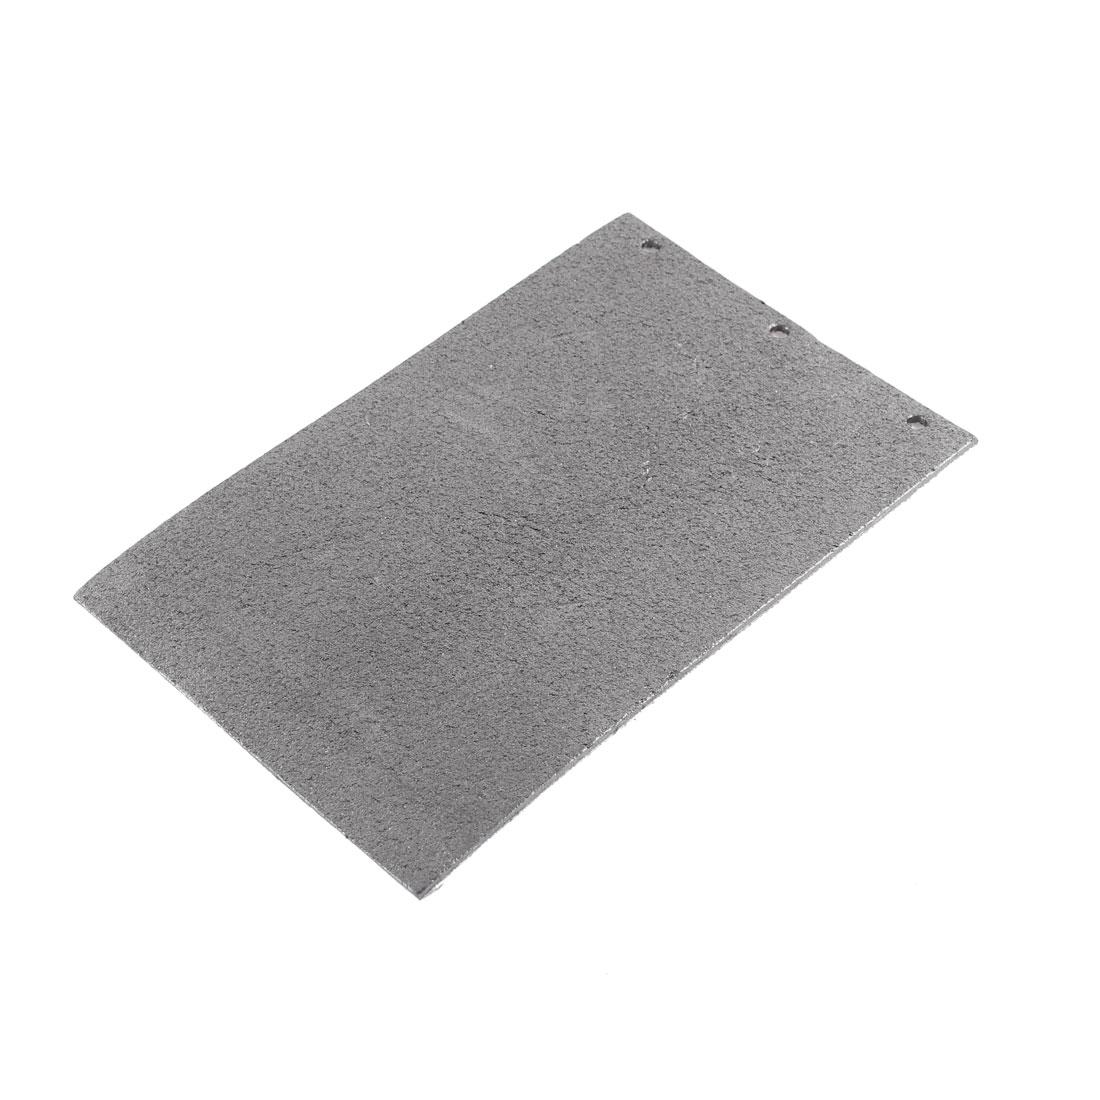 Carbon Base Pad Cloth Backing Backer Sheet 170x110mm for Makita 9403 Belt Sander